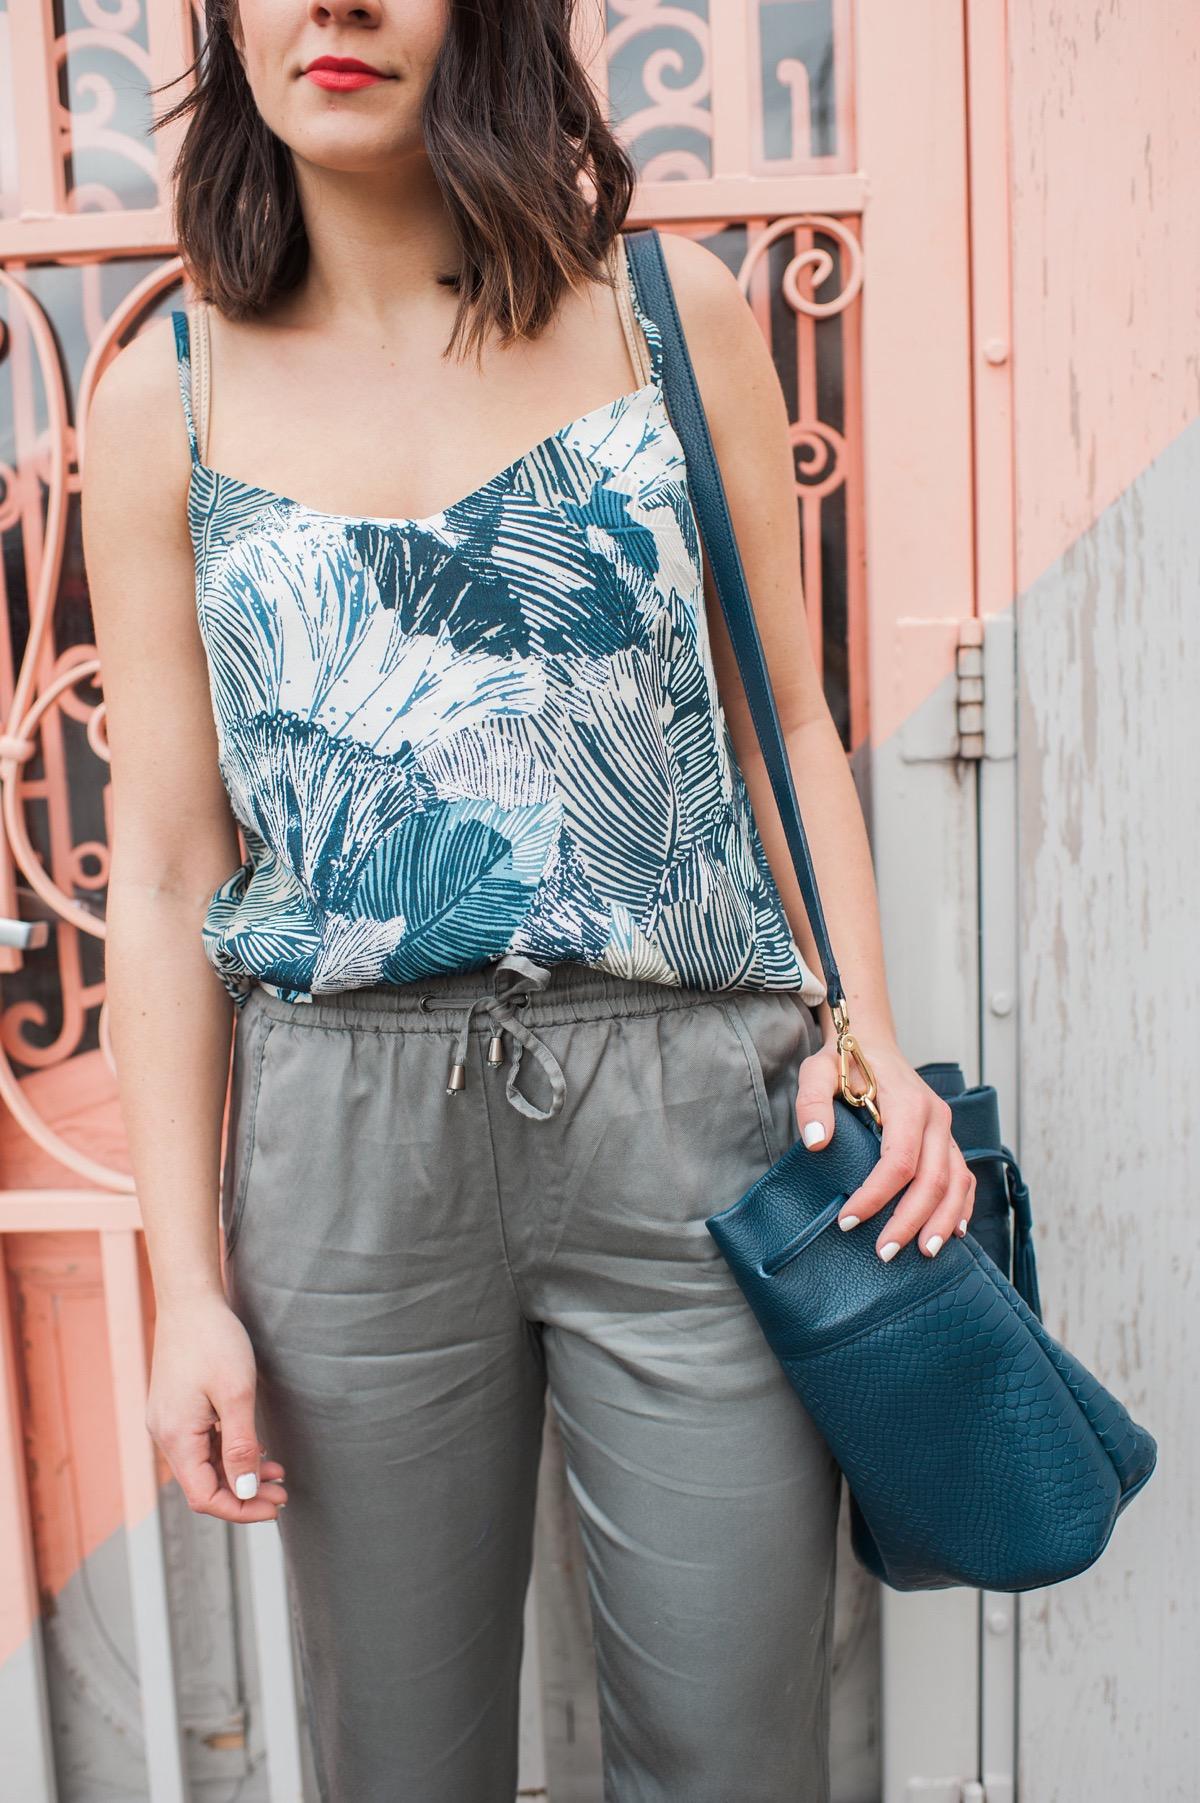 FCUK palm print tank and jogger pants - fashion blog - outfit ideas - @mystylevita